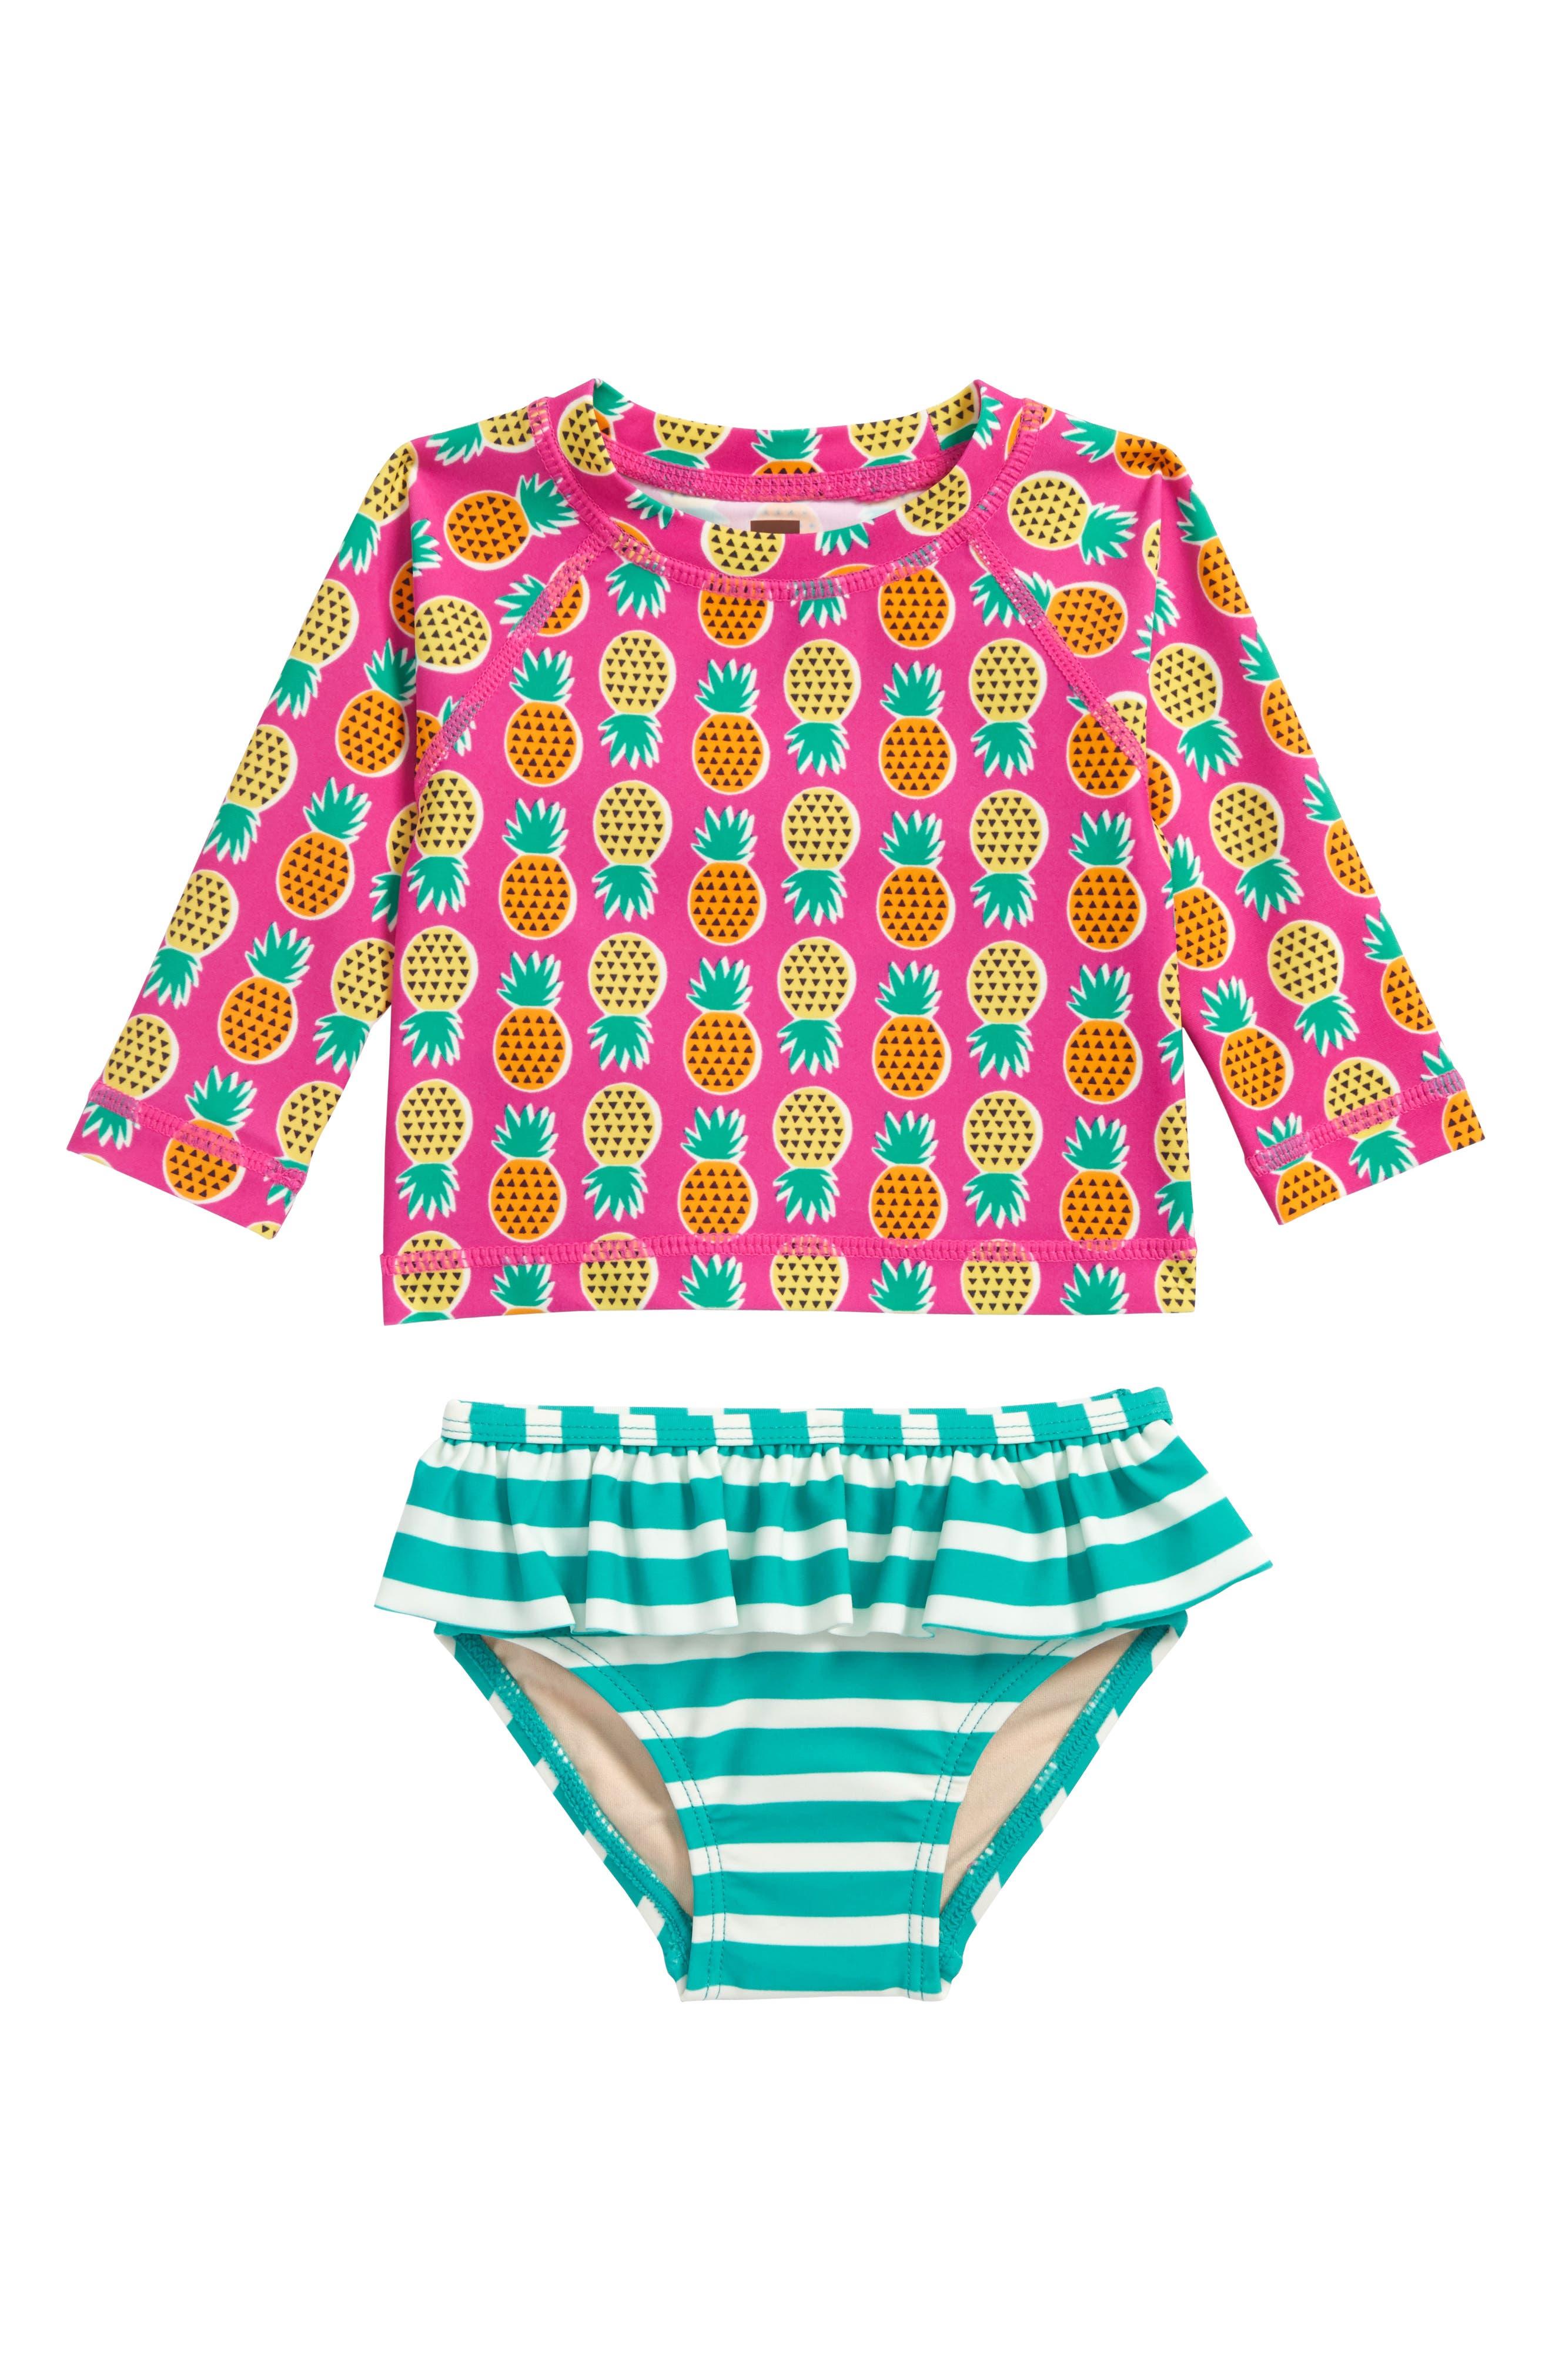 Mixed Print Two-Piece Rashguard Swimsuit,                             Main thumbnail 1, color,                             Tropical Pineapples